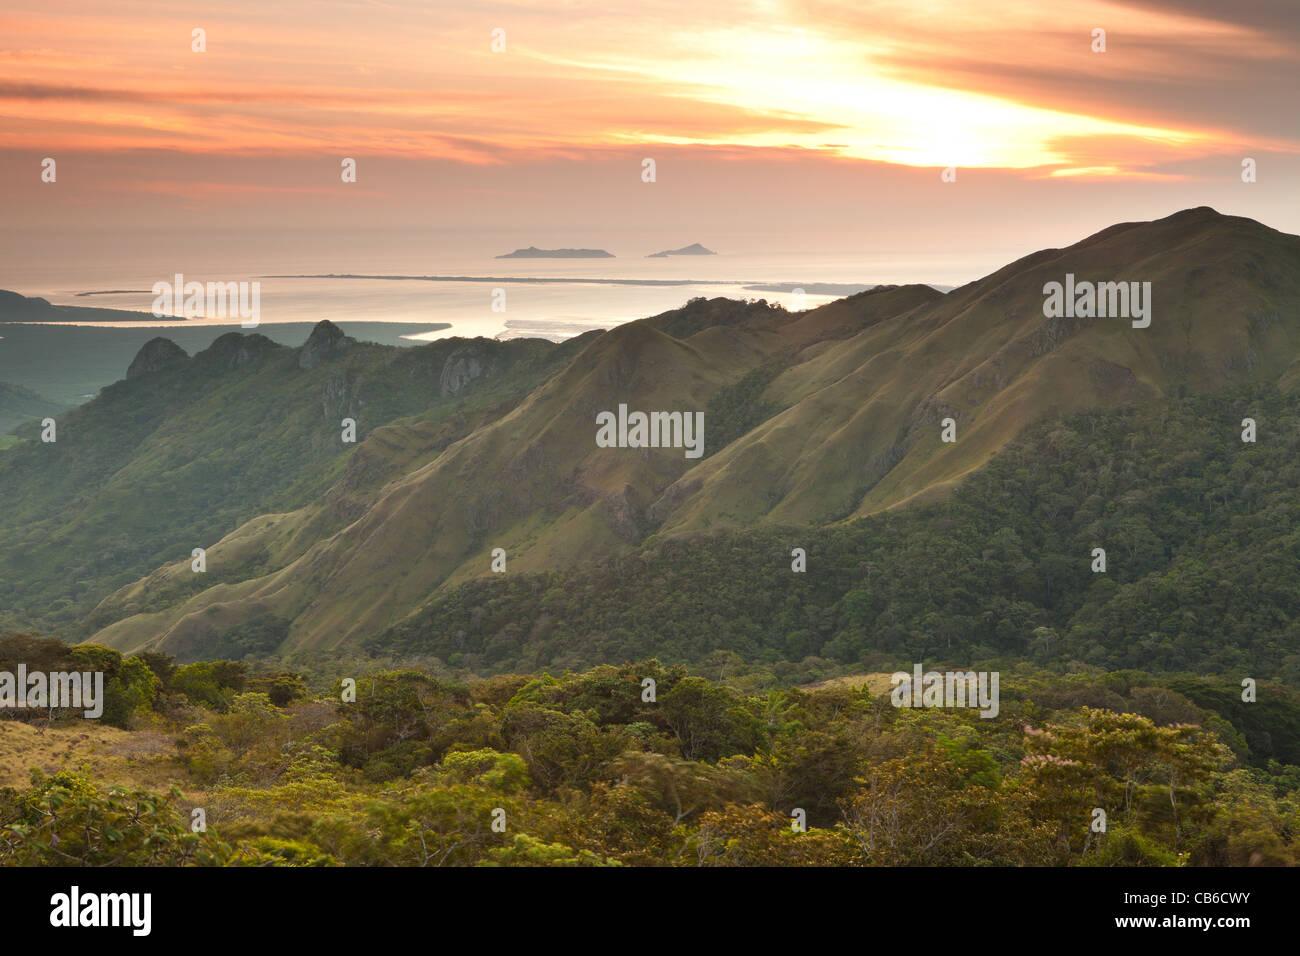 Daybreak in Altos de Campana national park, Panama province, Republic of Panama. - Stock Image